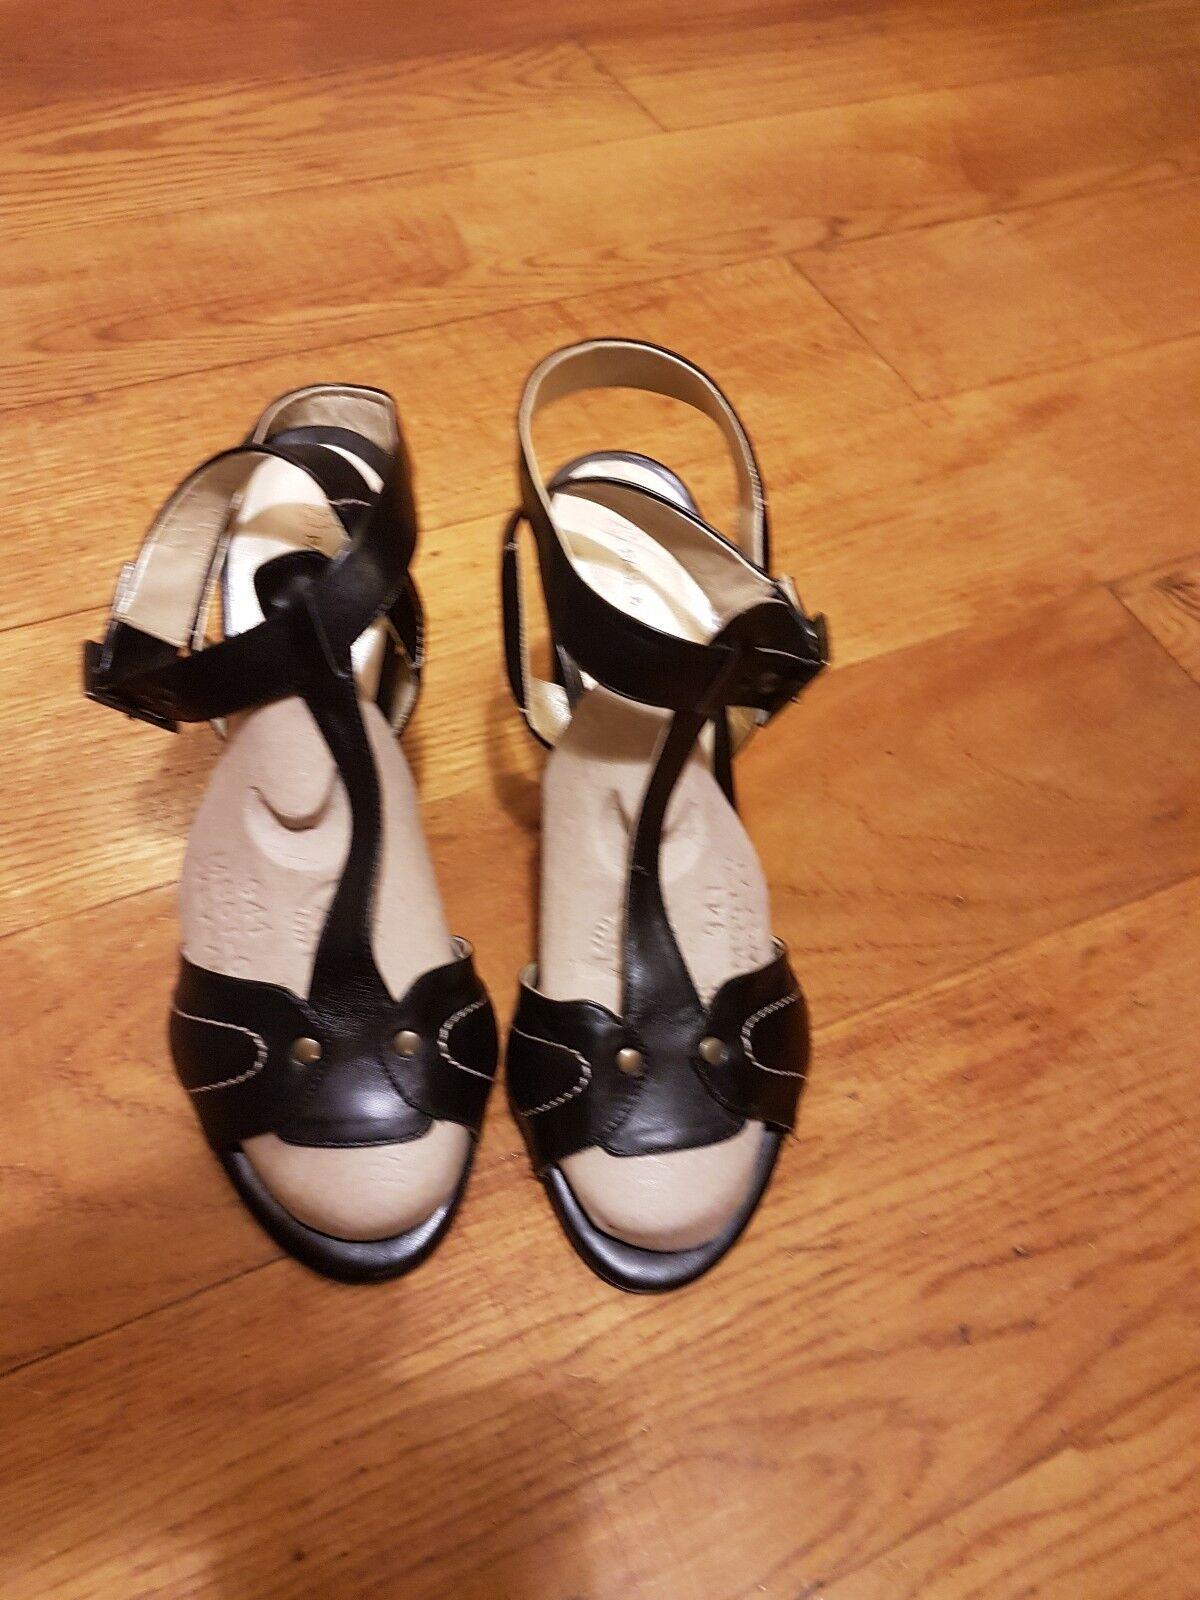 Paul & Joe Brand New Leather Sandals Heels EU40